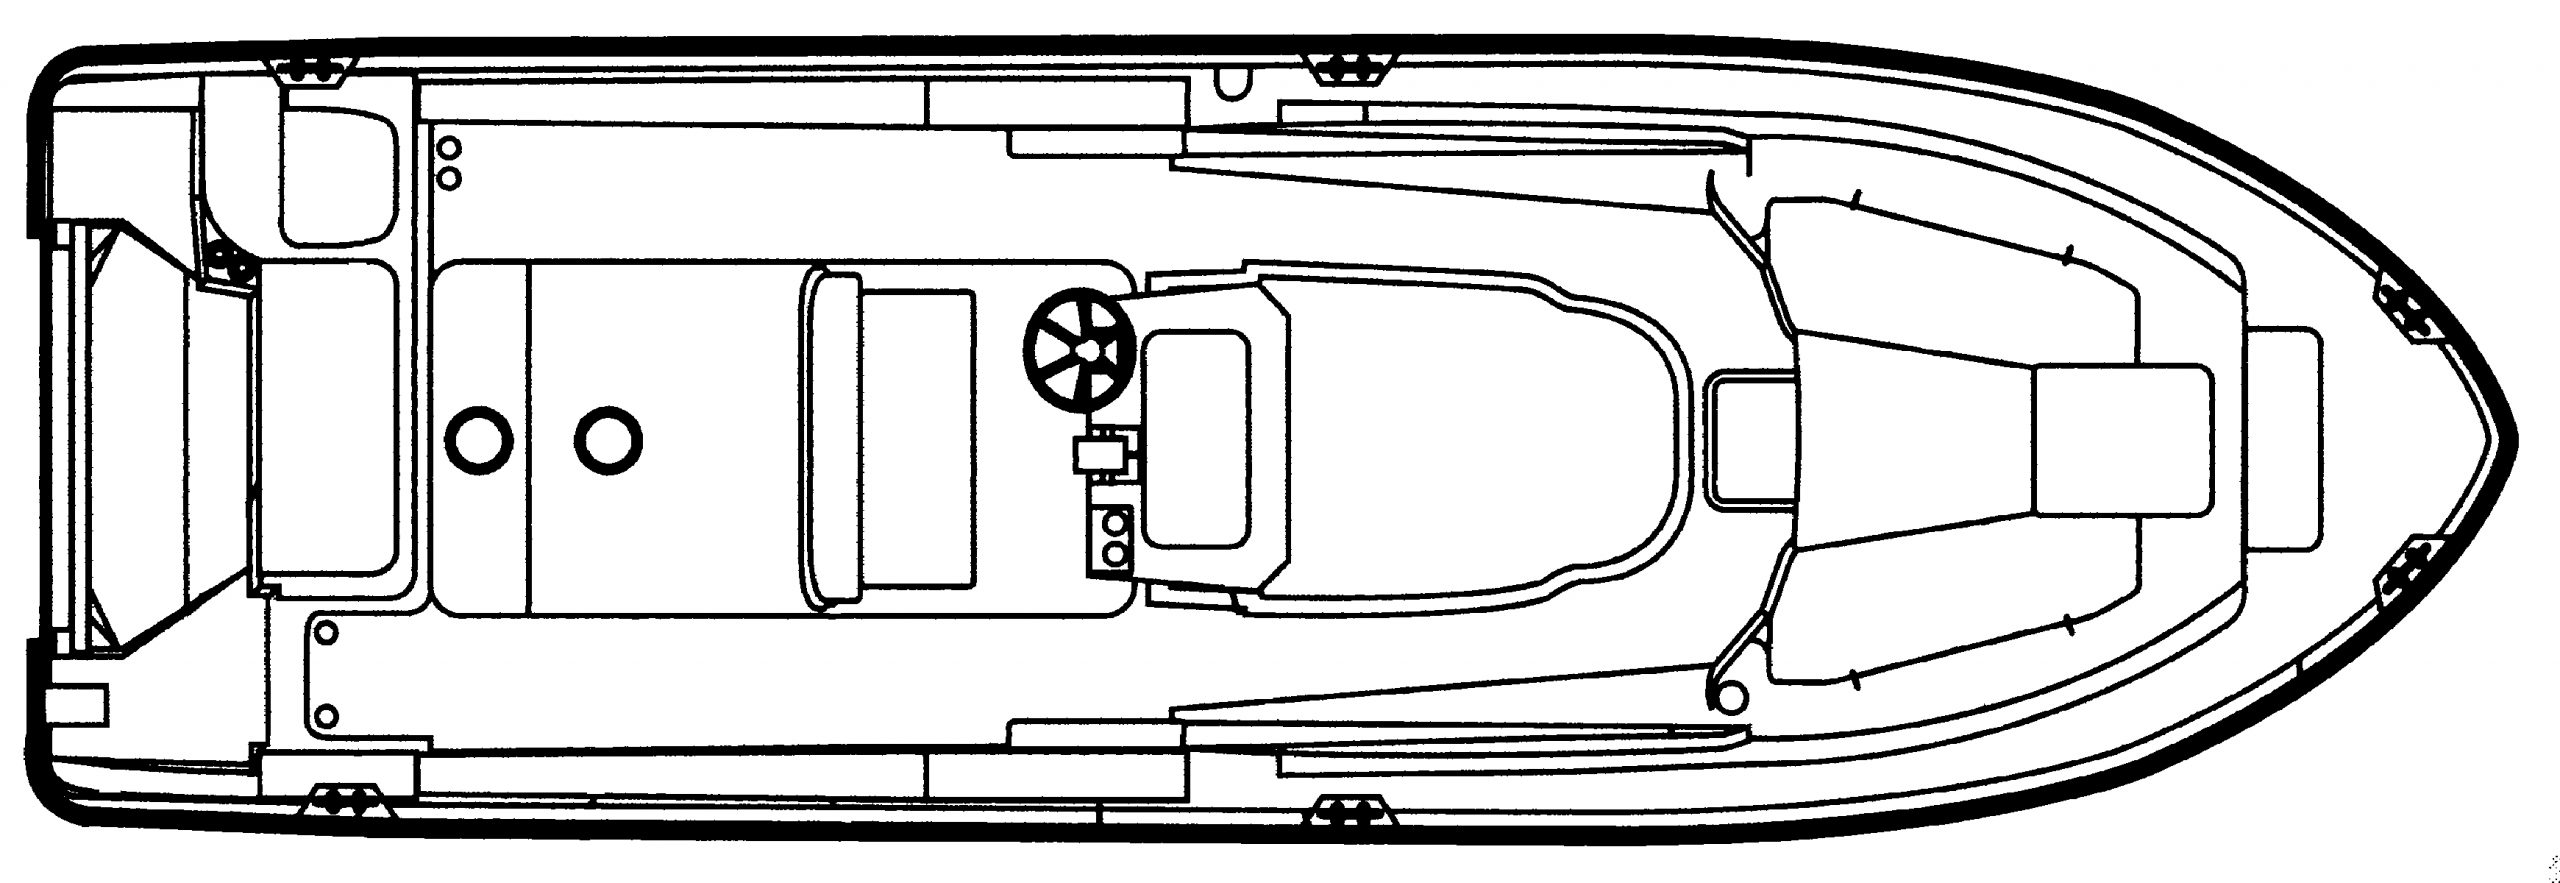 263-273 Chase Floor Plan 1